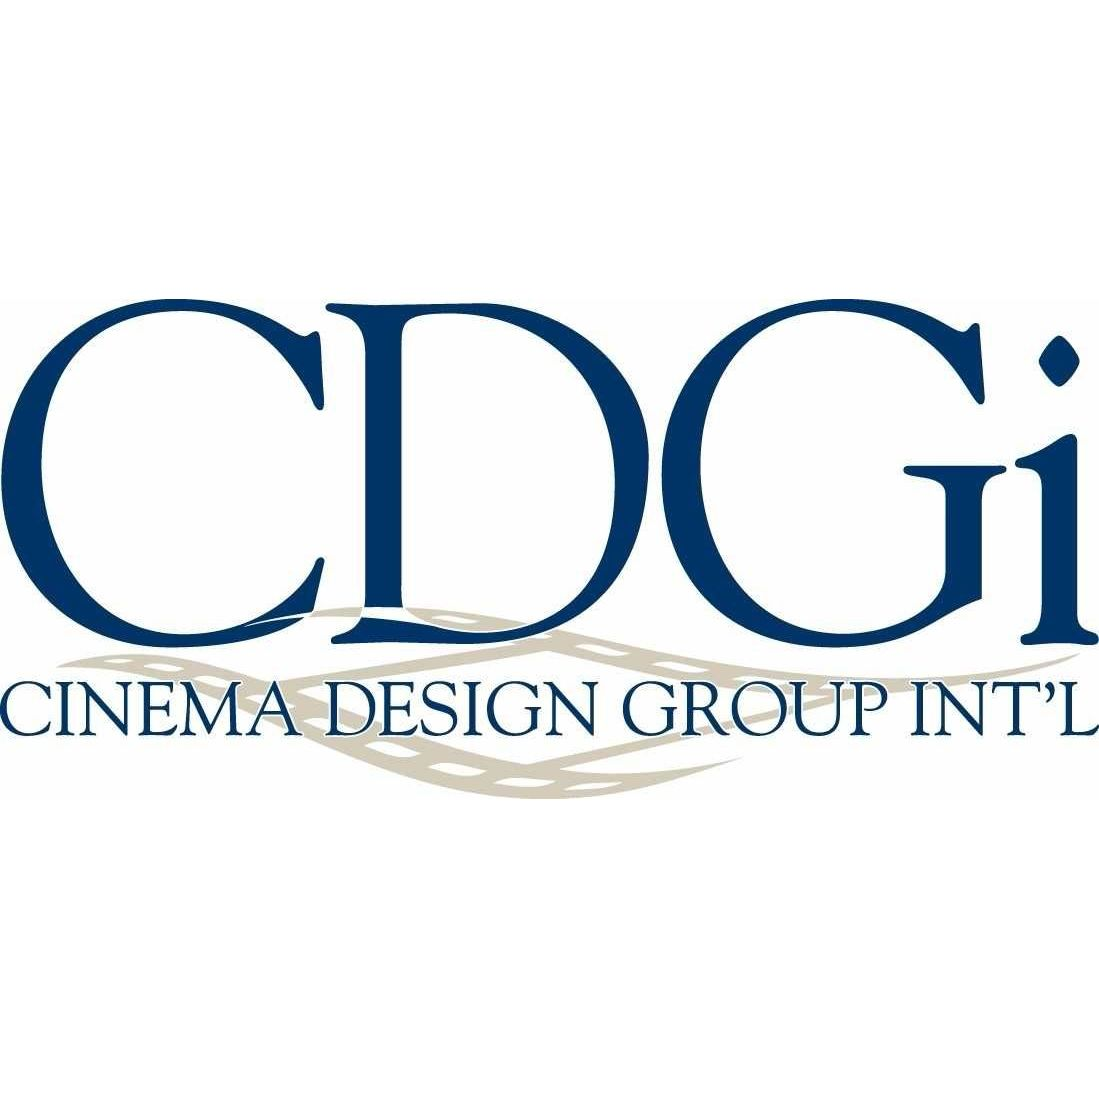 Cinema Design Group International image 1